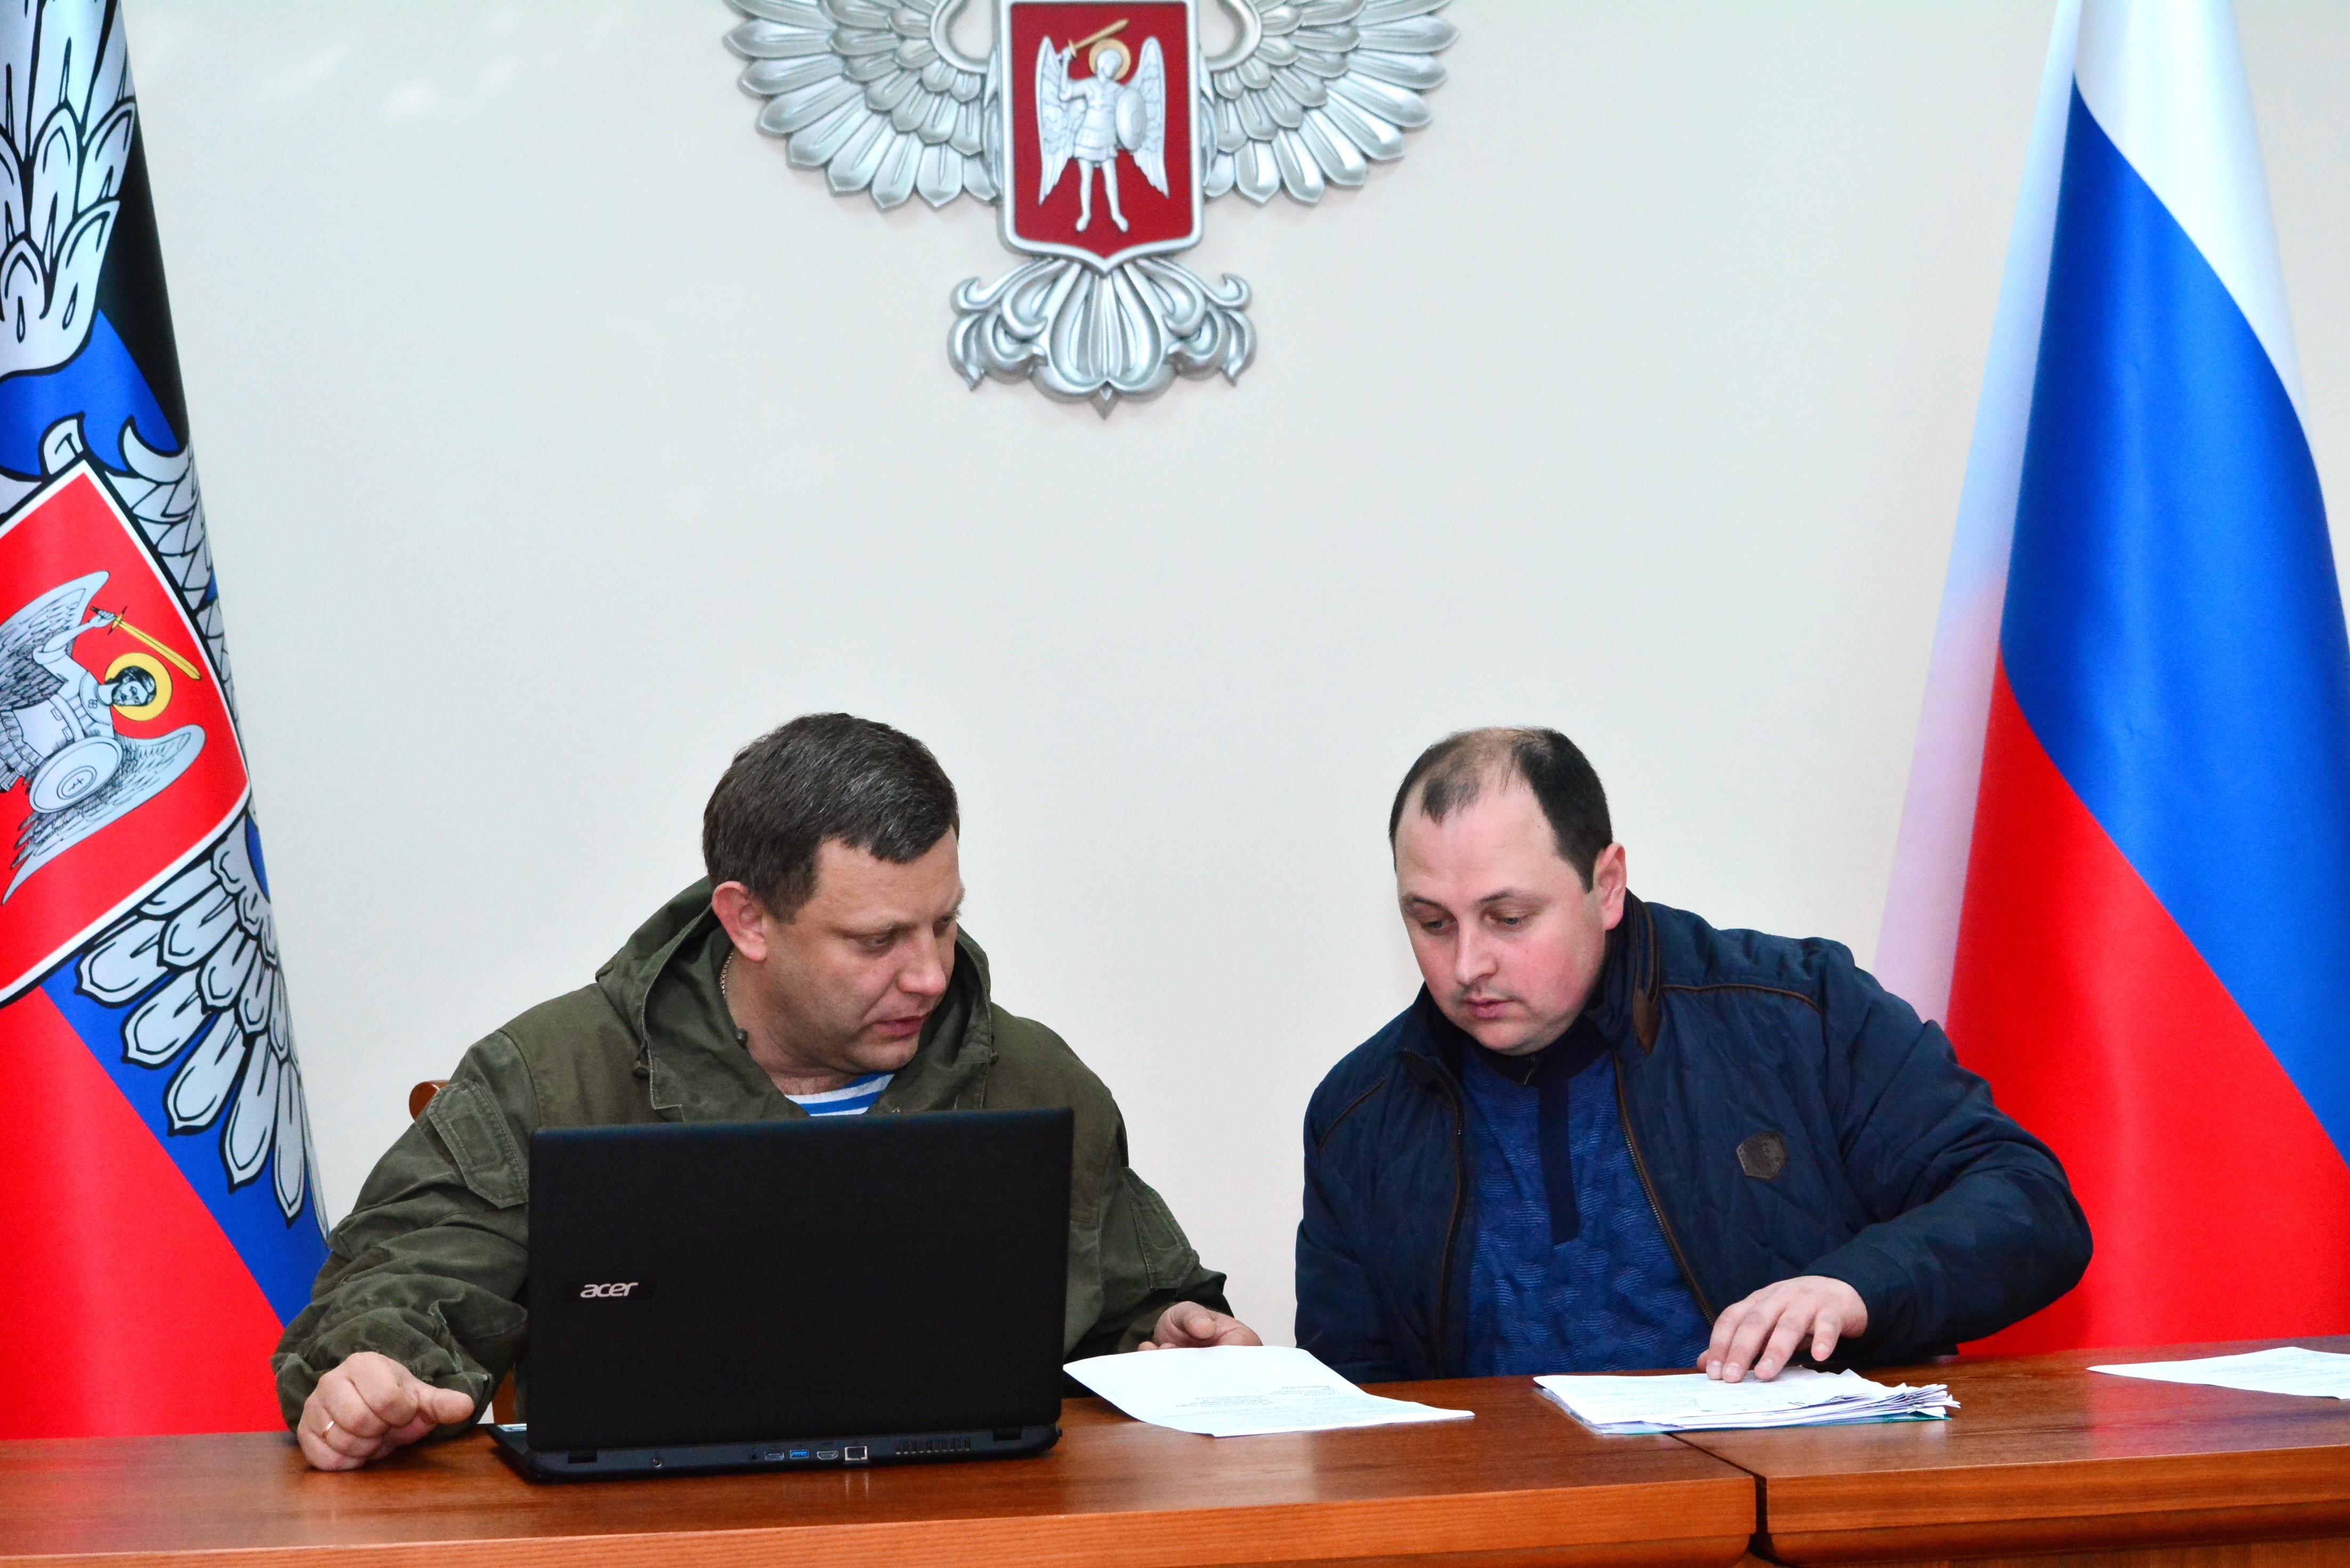 <p><span>Александр Захарченко (слева) и&nbsp;Дмитрий Трапезников.&nbsp;Фото &copy; РИА Новости/Игорь Маслов</span></p>